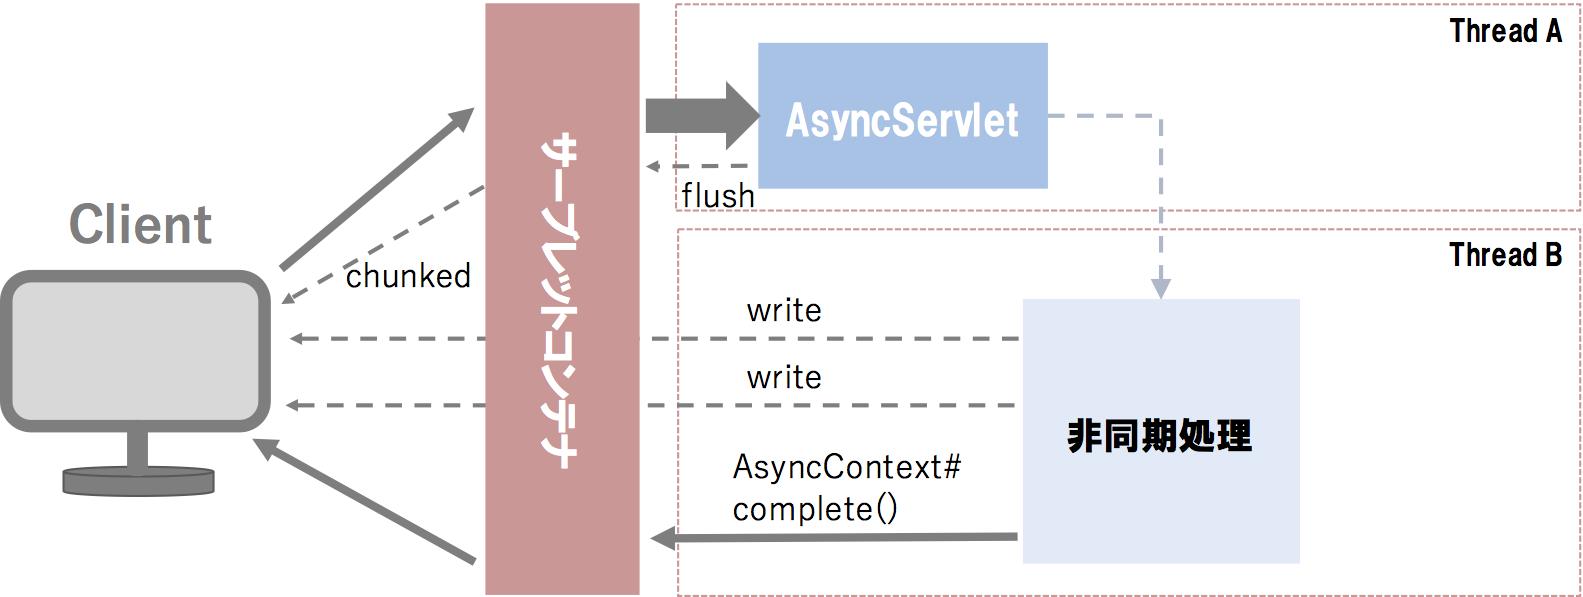 servlet-async-chunked.png